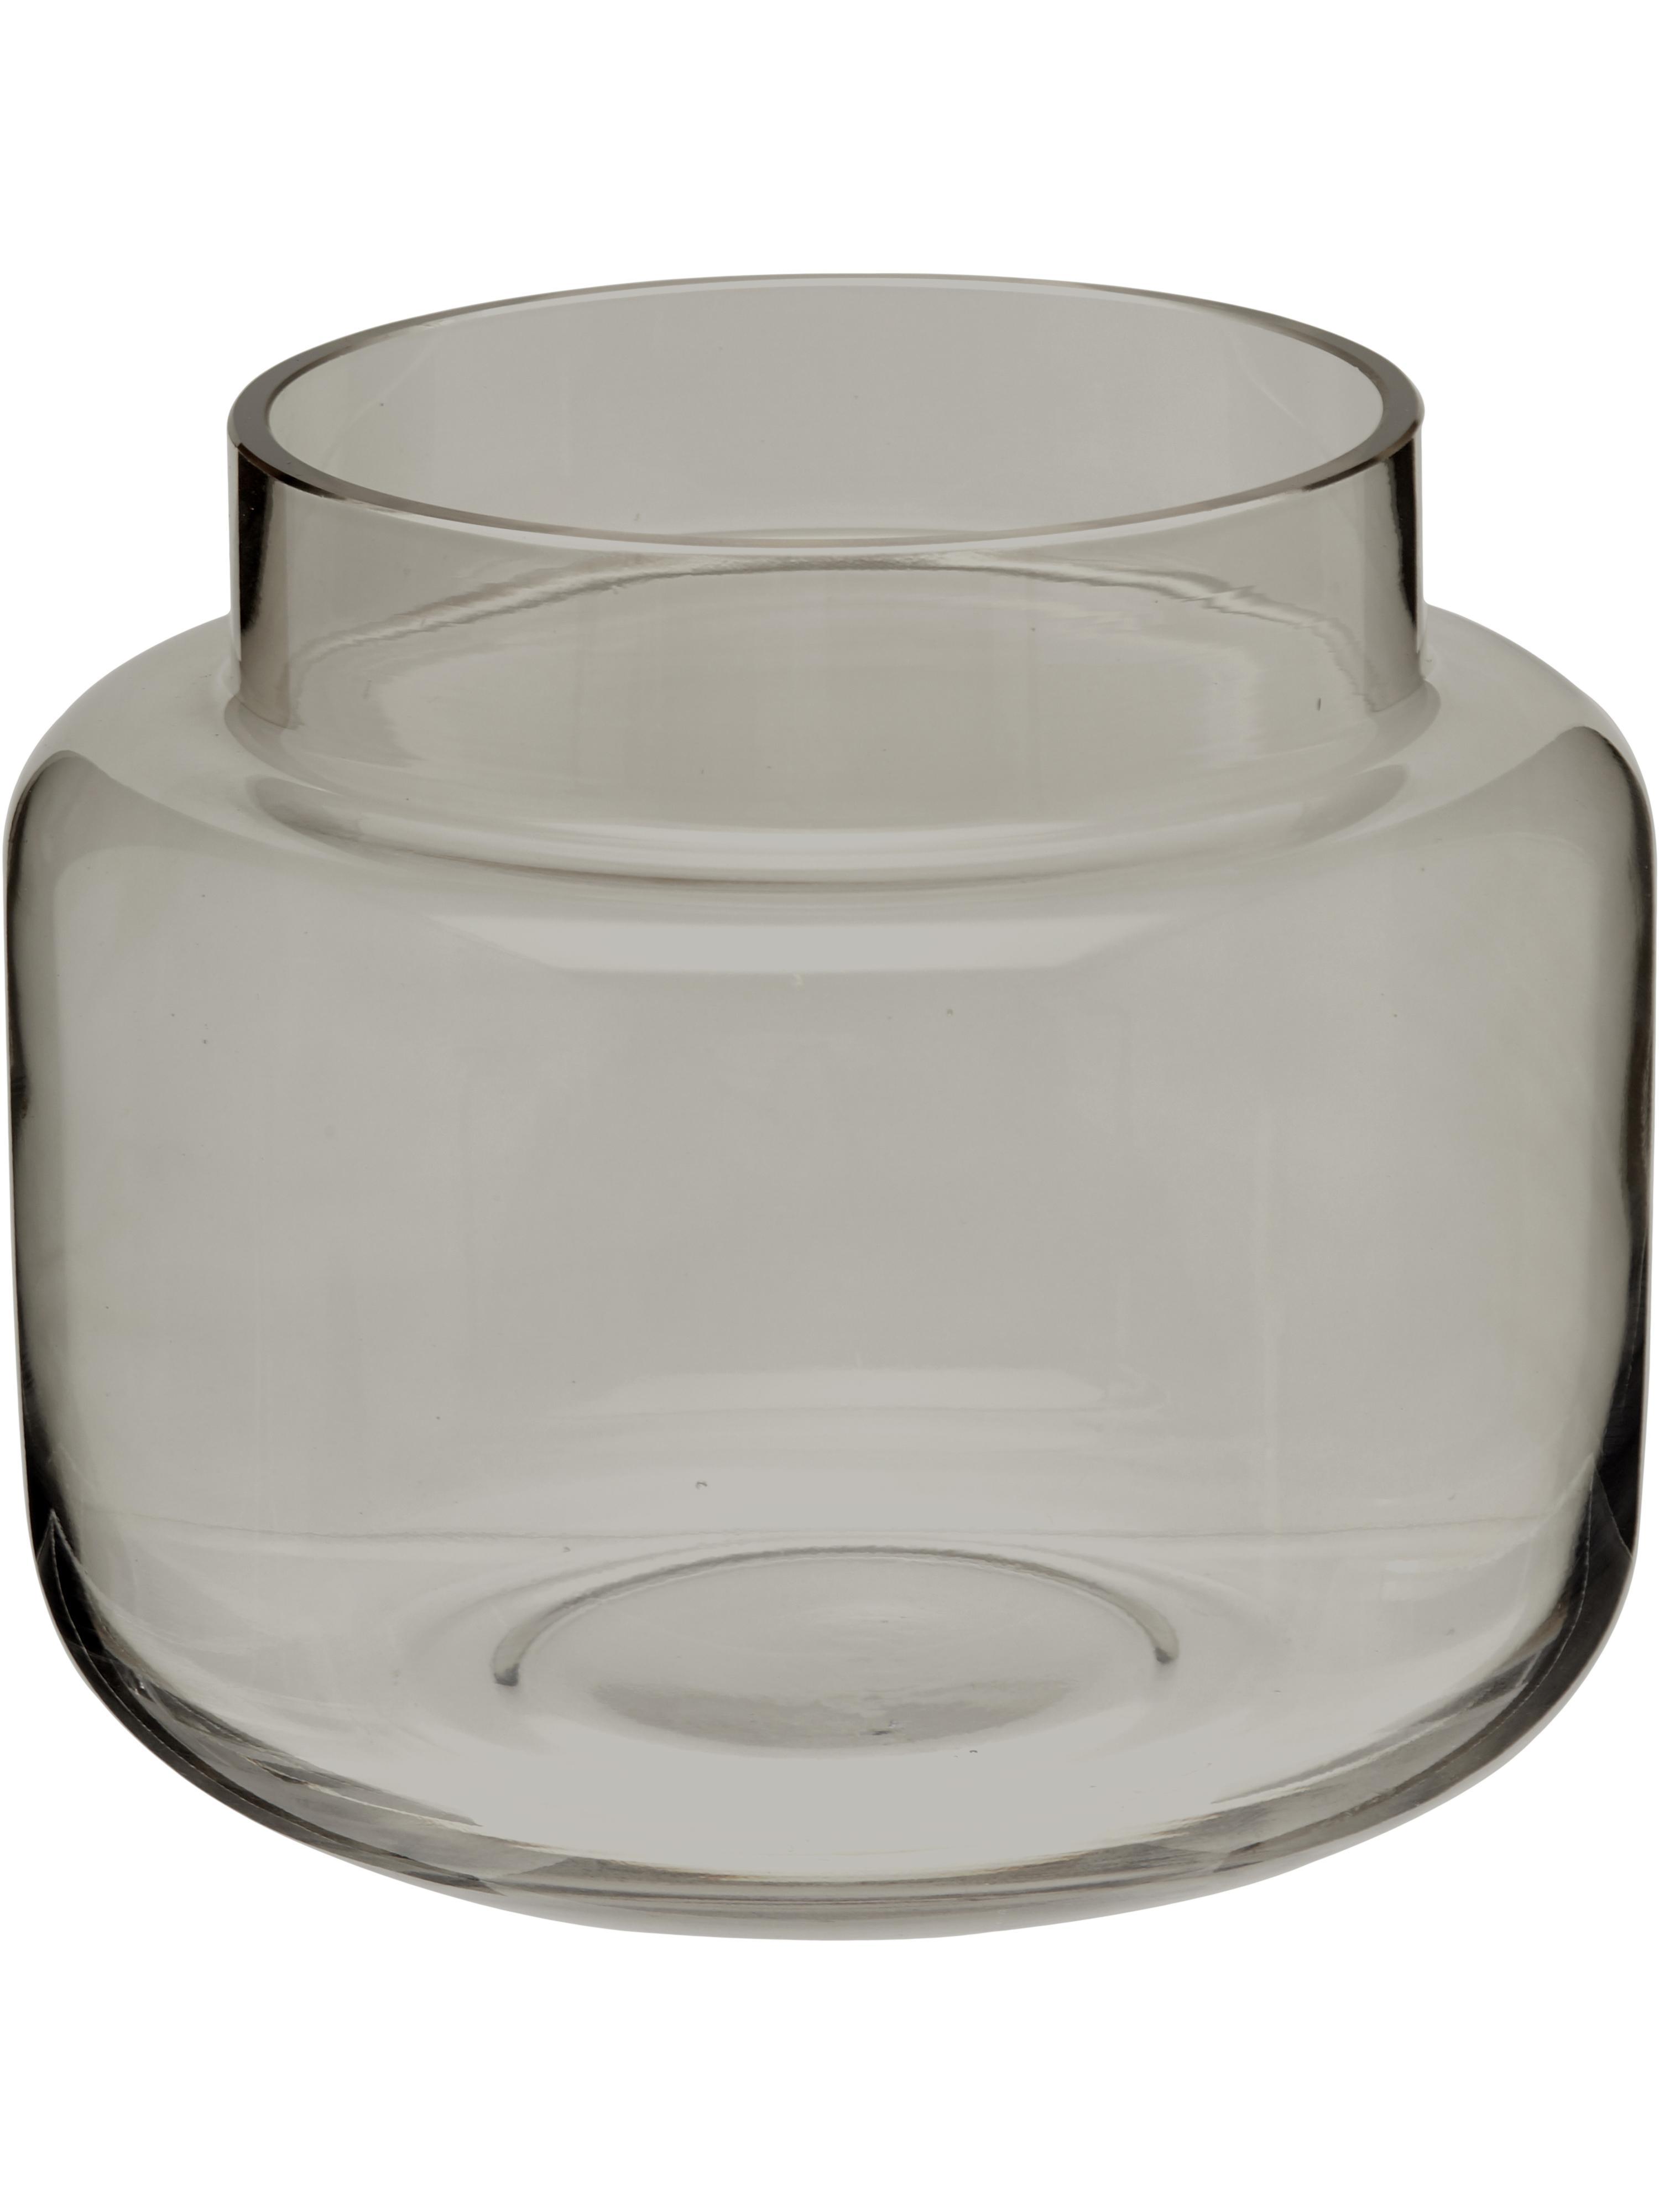 Jarrón mediano de vidrio Lasse, Vidrio, Gris, transparente, Ø 16 x Al 14 cm